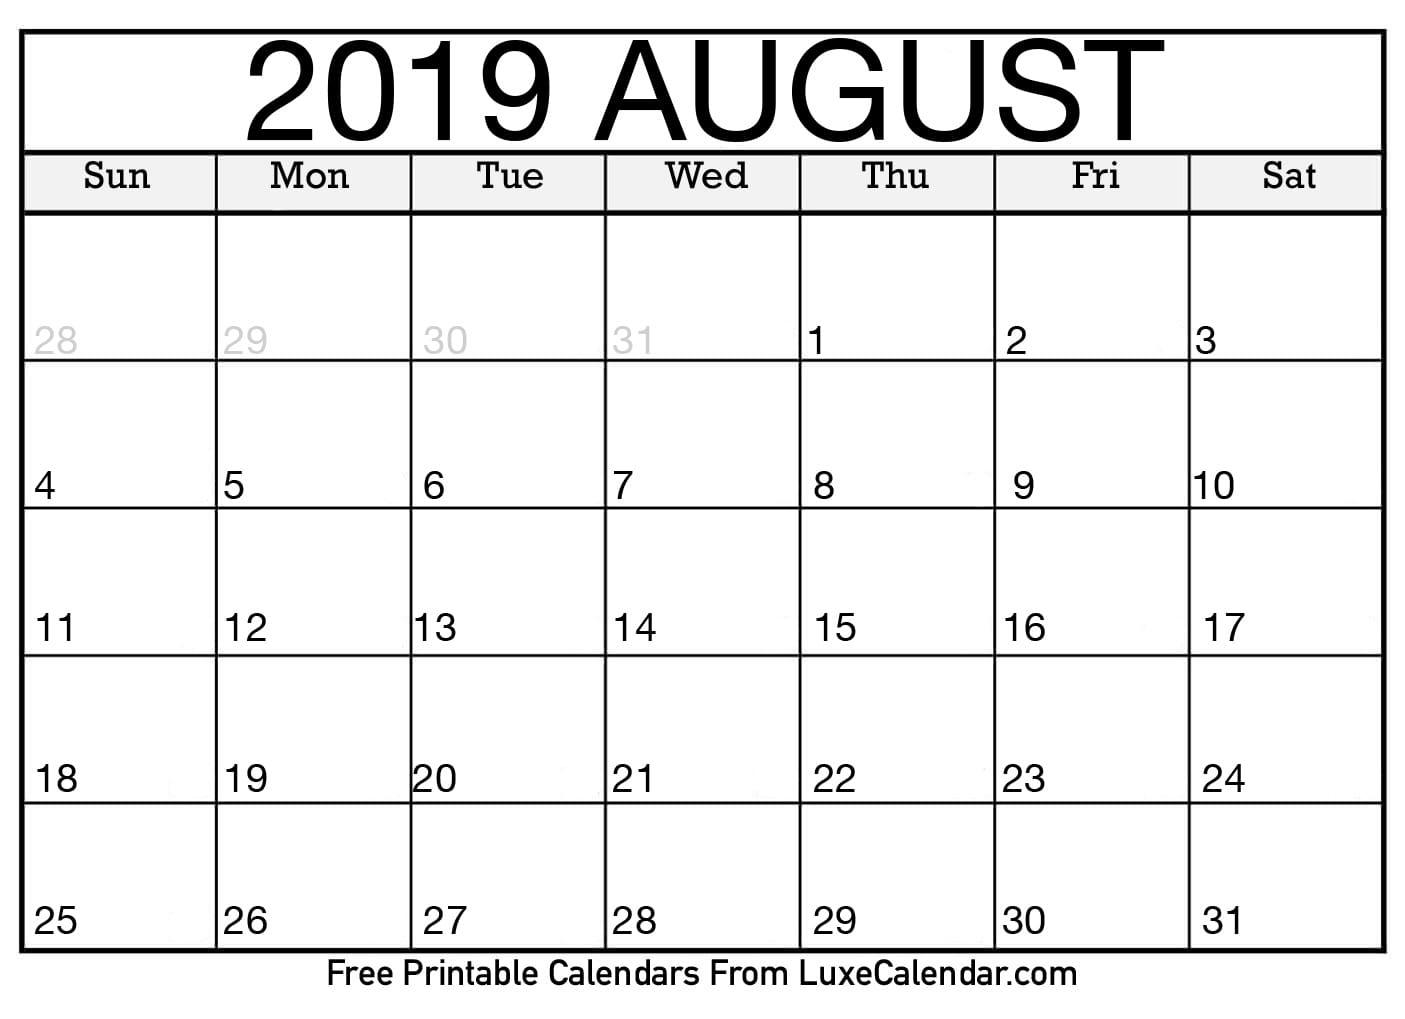 Blank August 2019 Calendar Template - Printable Calendar 2019  Blank regarding Pretty Blank Augst Calender